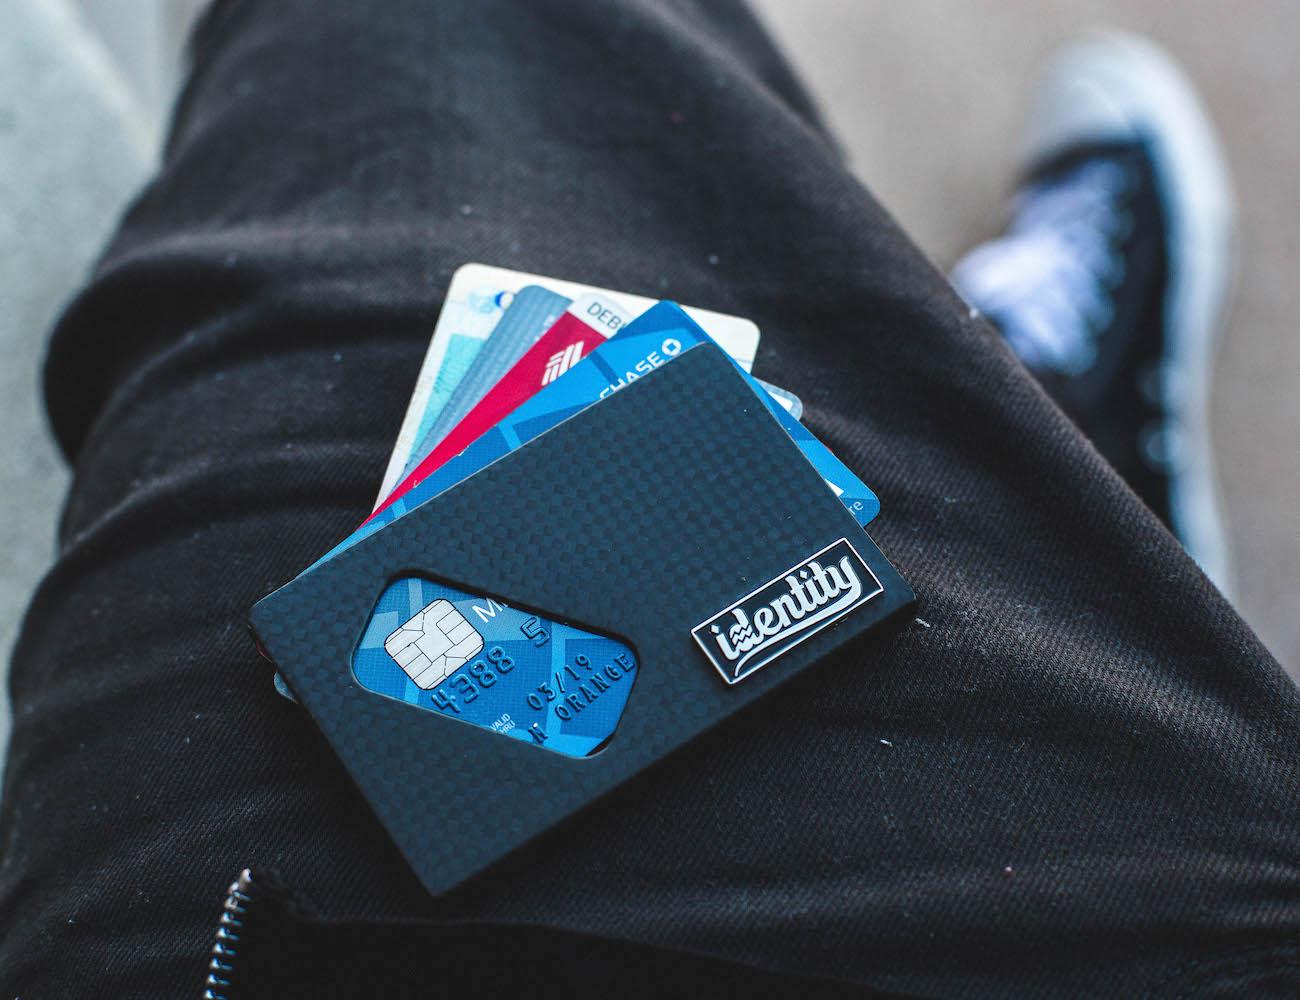 identity-card-wallet-04